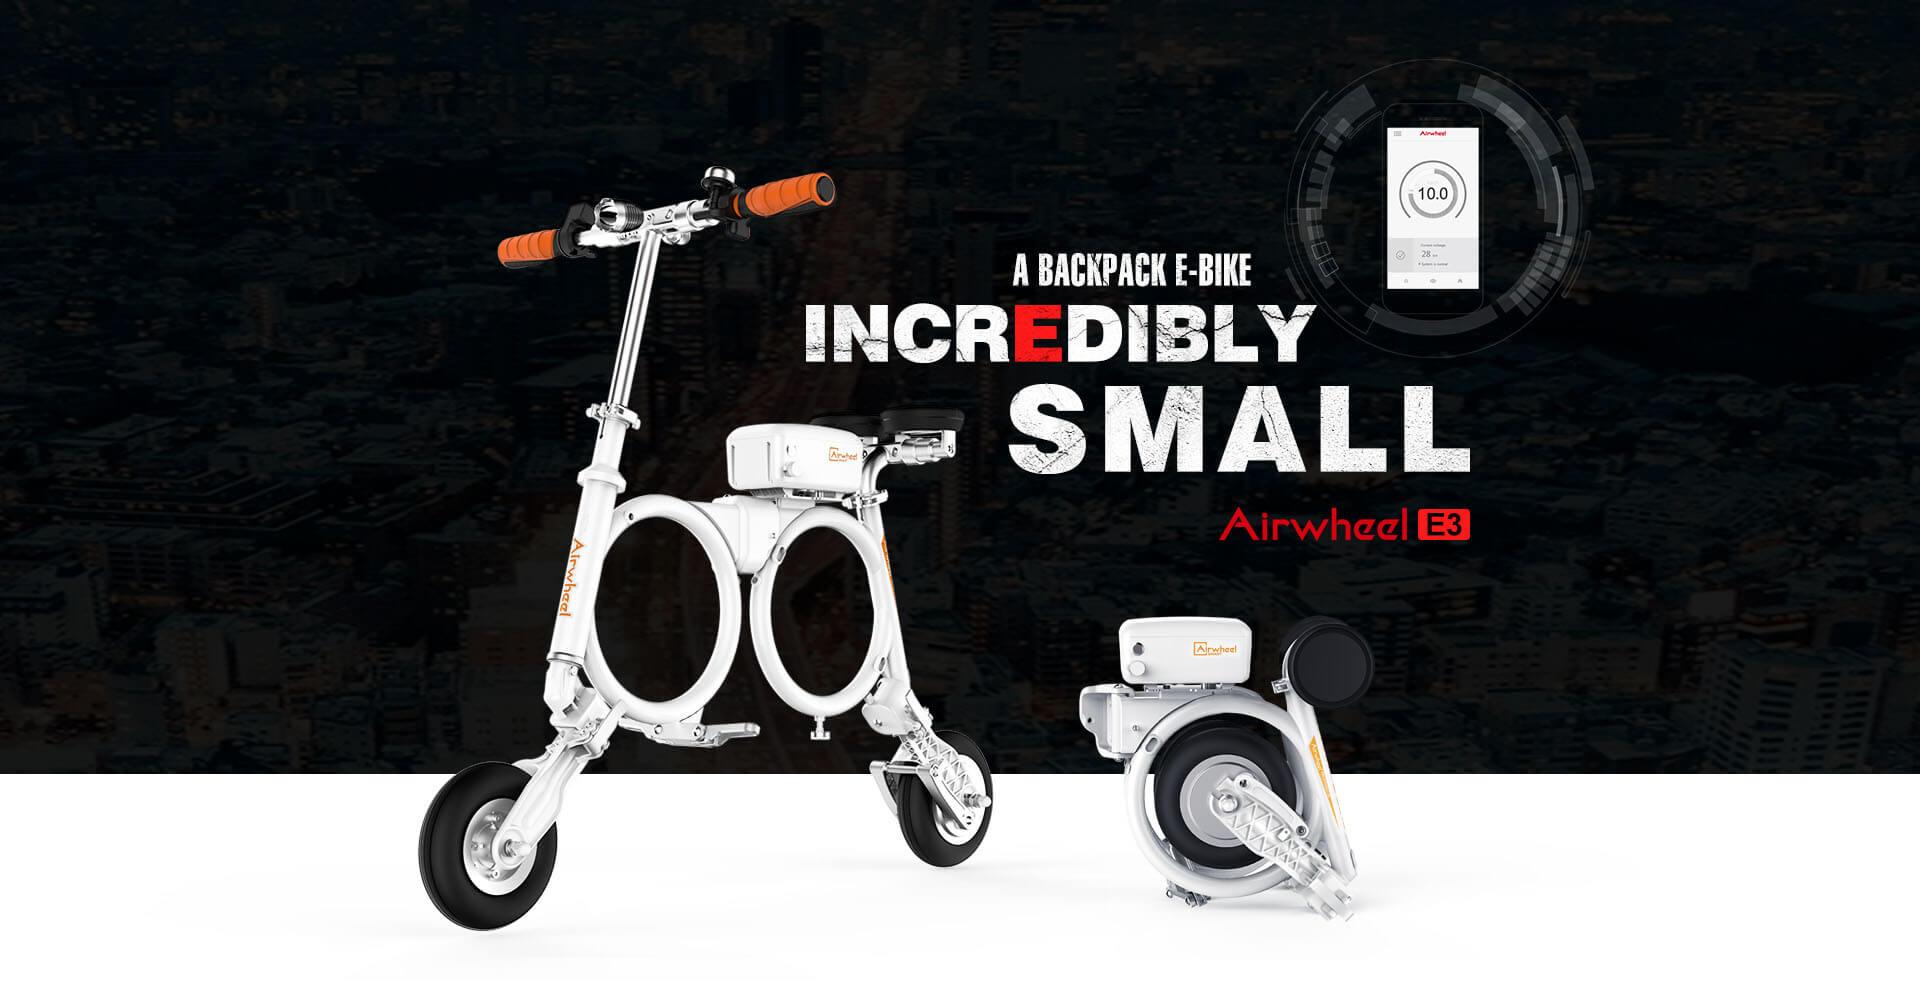 Airwheel E3 smart electric folding bike